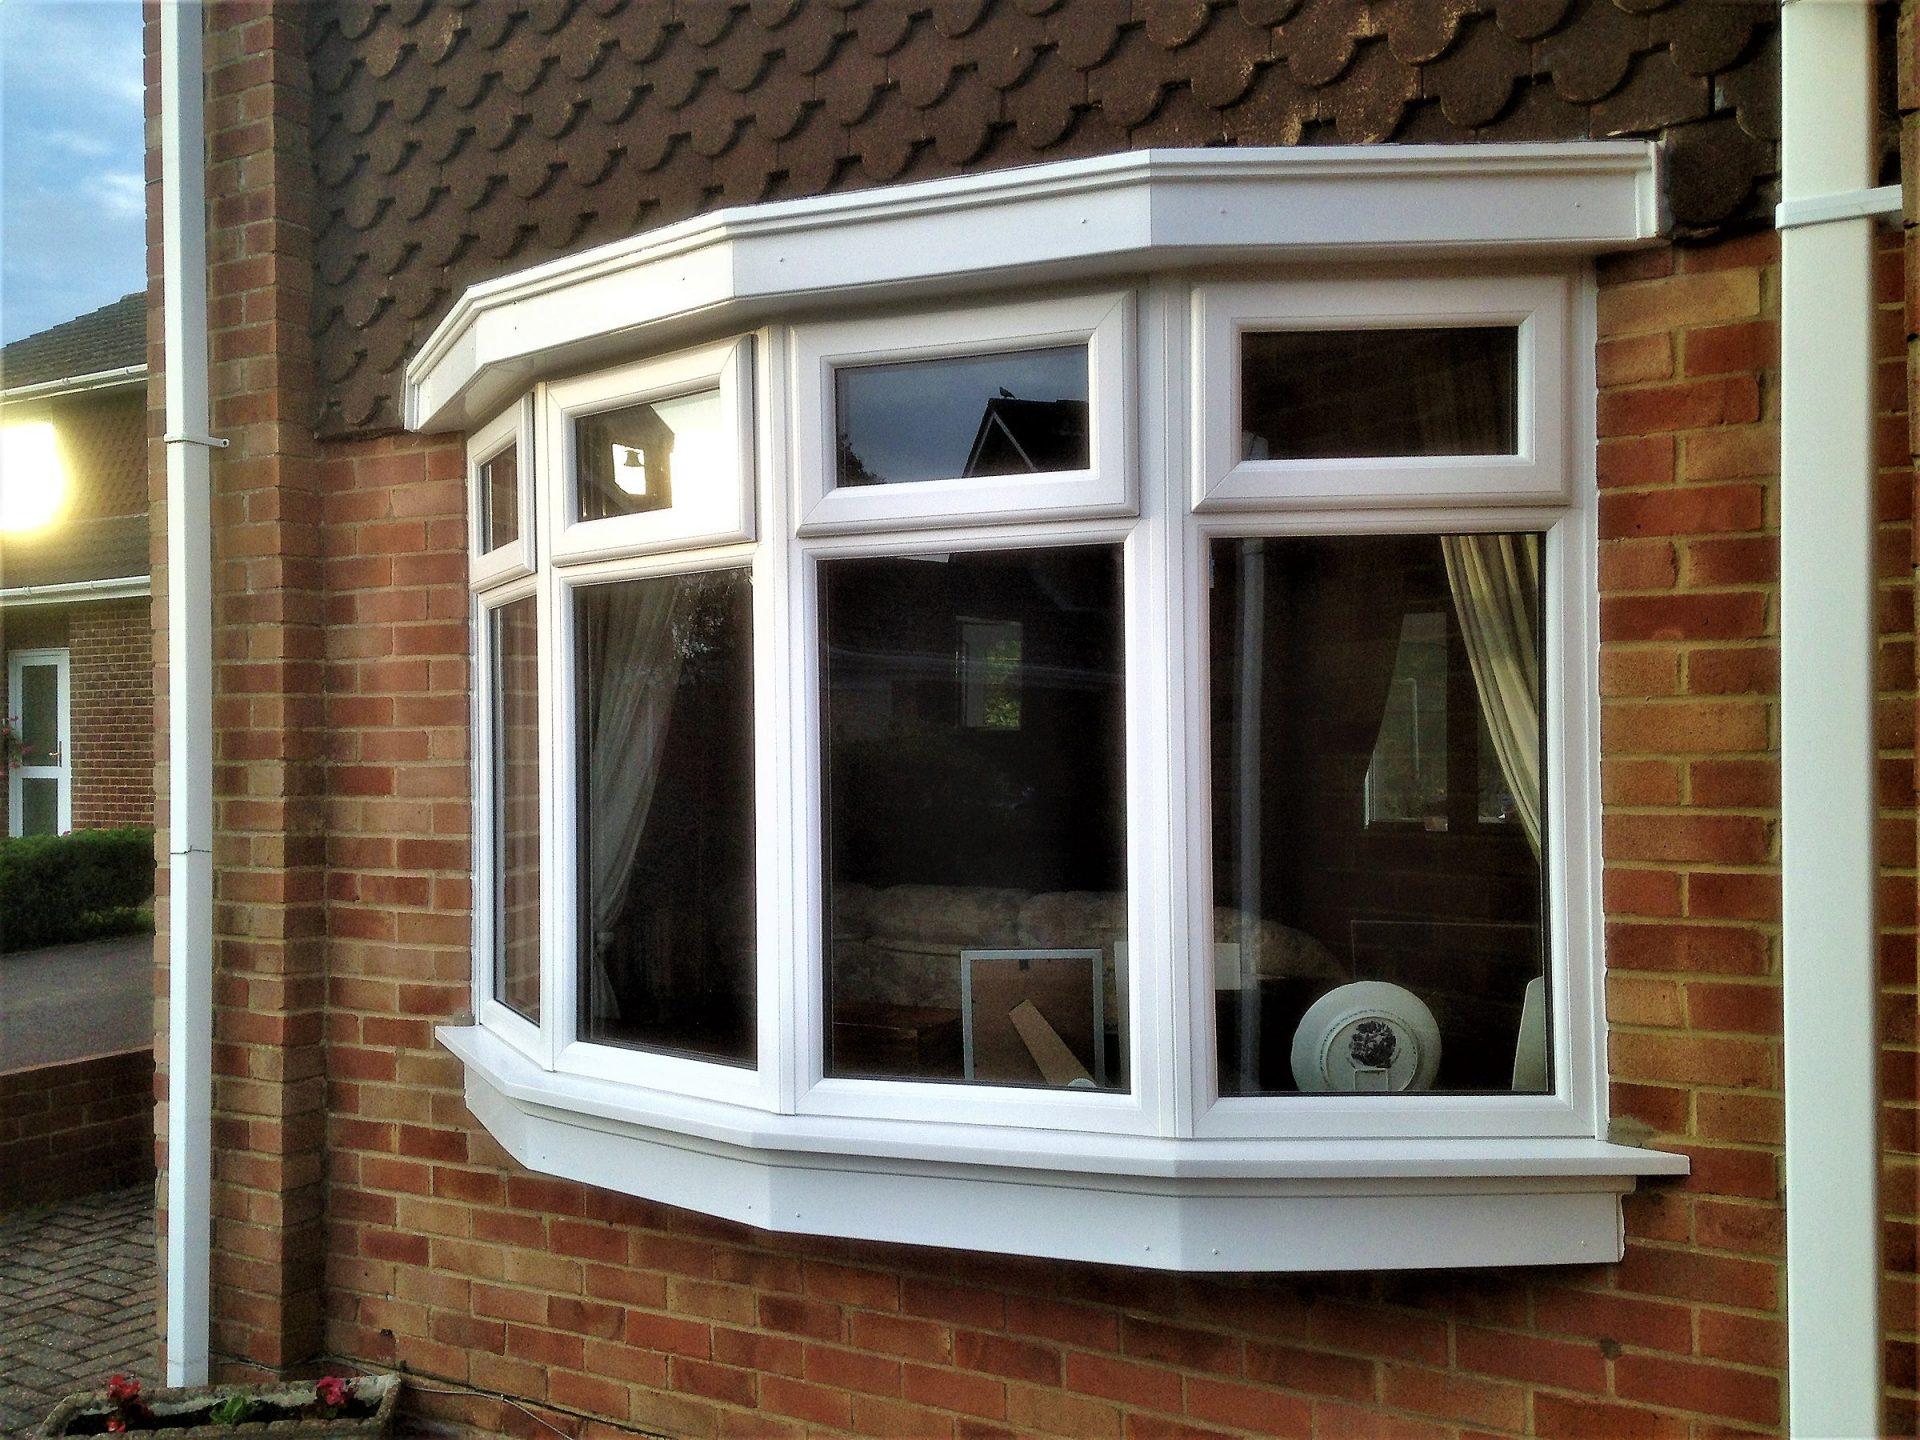 Bay Windows Supplier in Hampshire